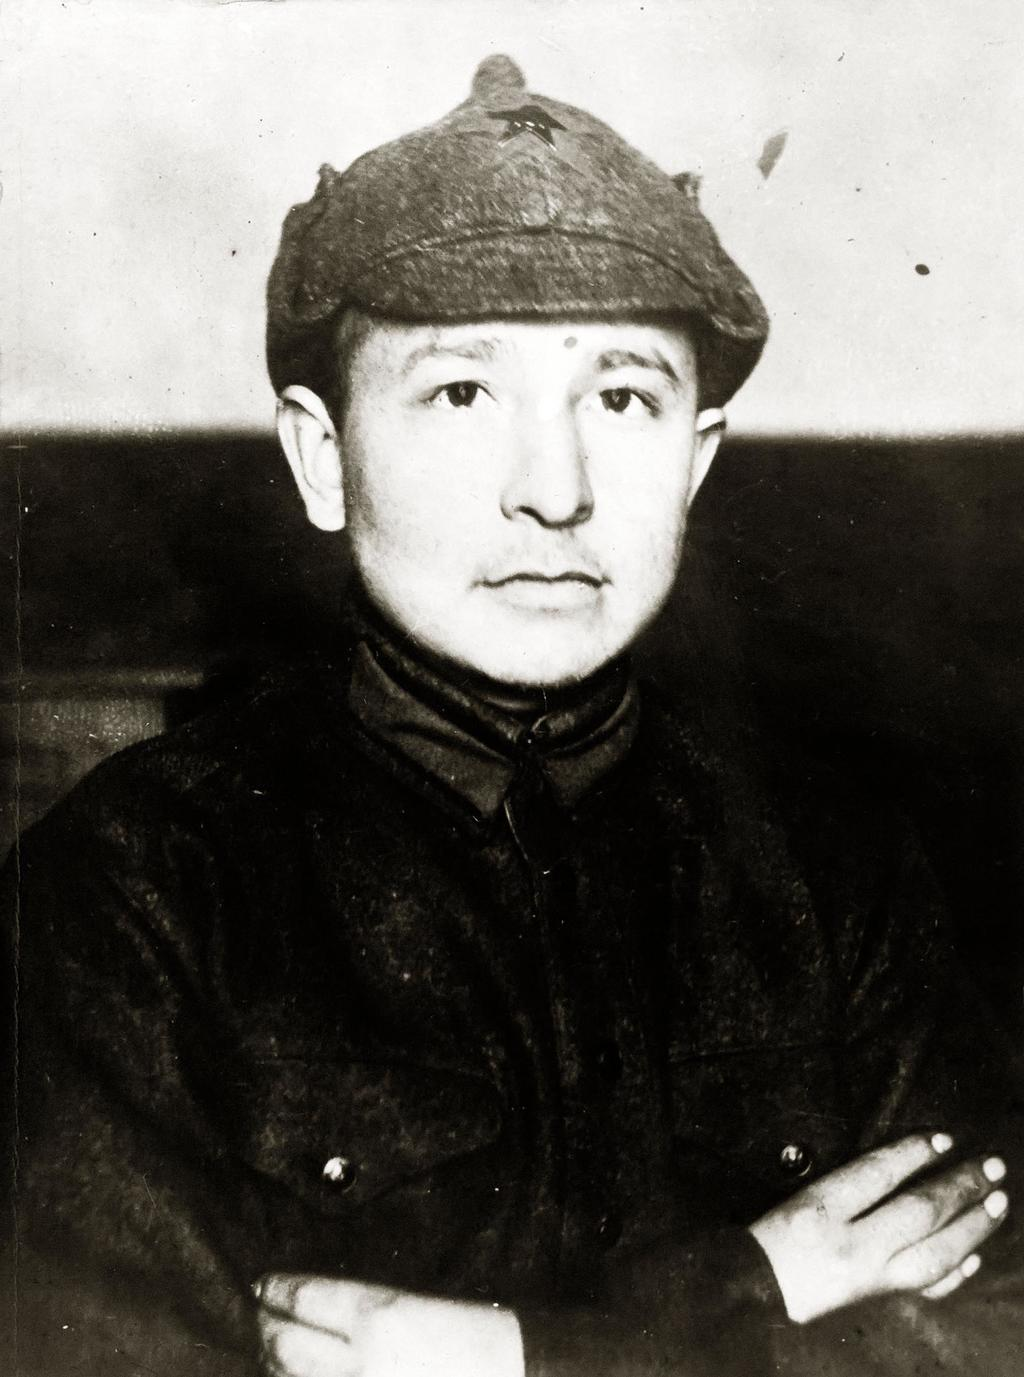 Фото. Сибгат Хаким во время службы в Красной армии. 1933 ©Tatfrontu.ru Photo Archive